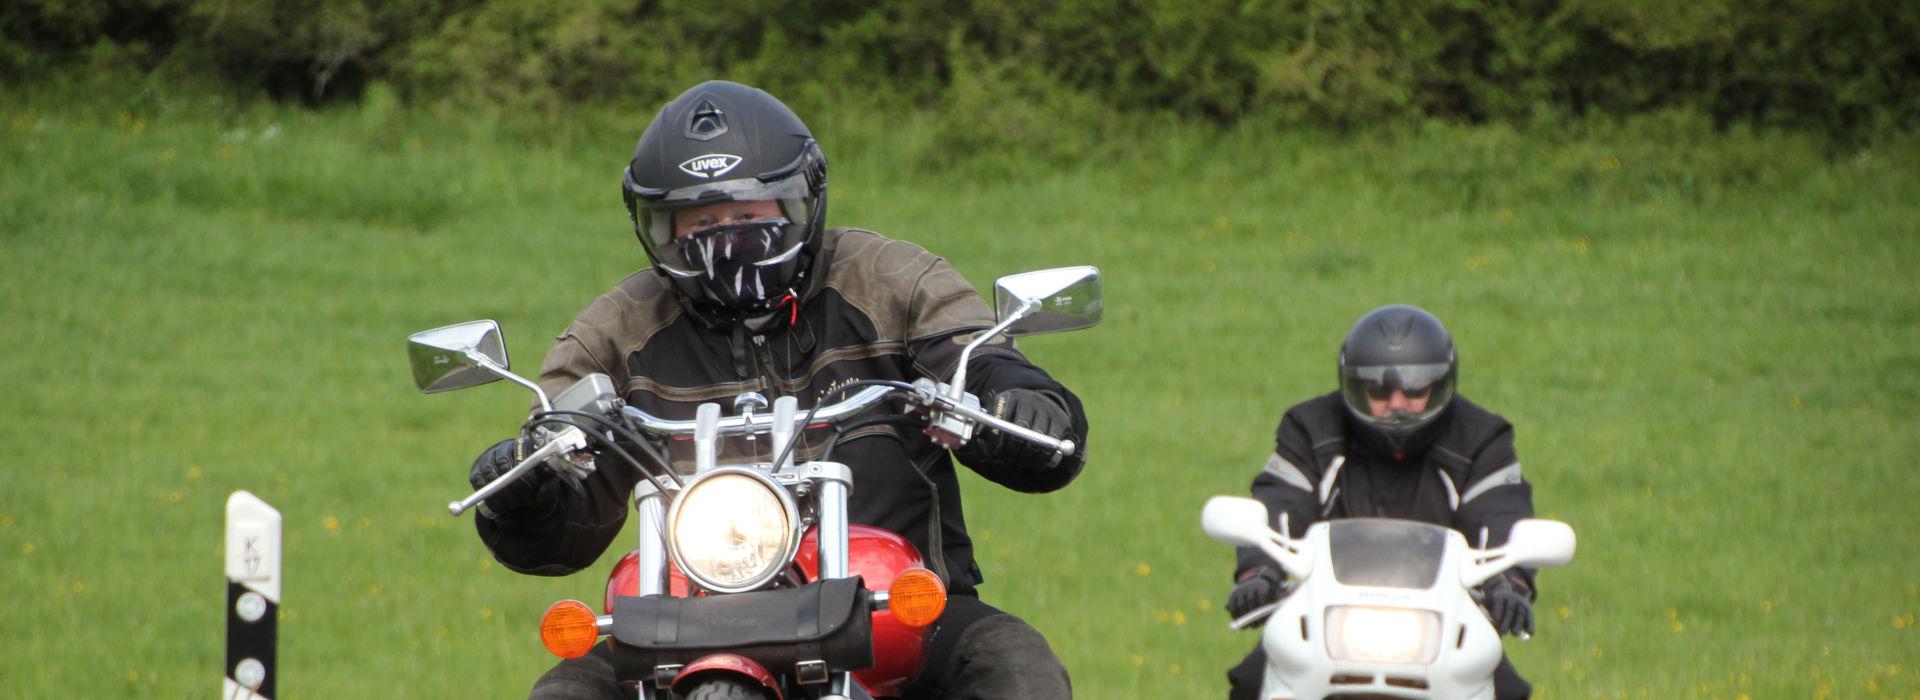 Motorrijbewijspoint Ridderkerk disclaimer